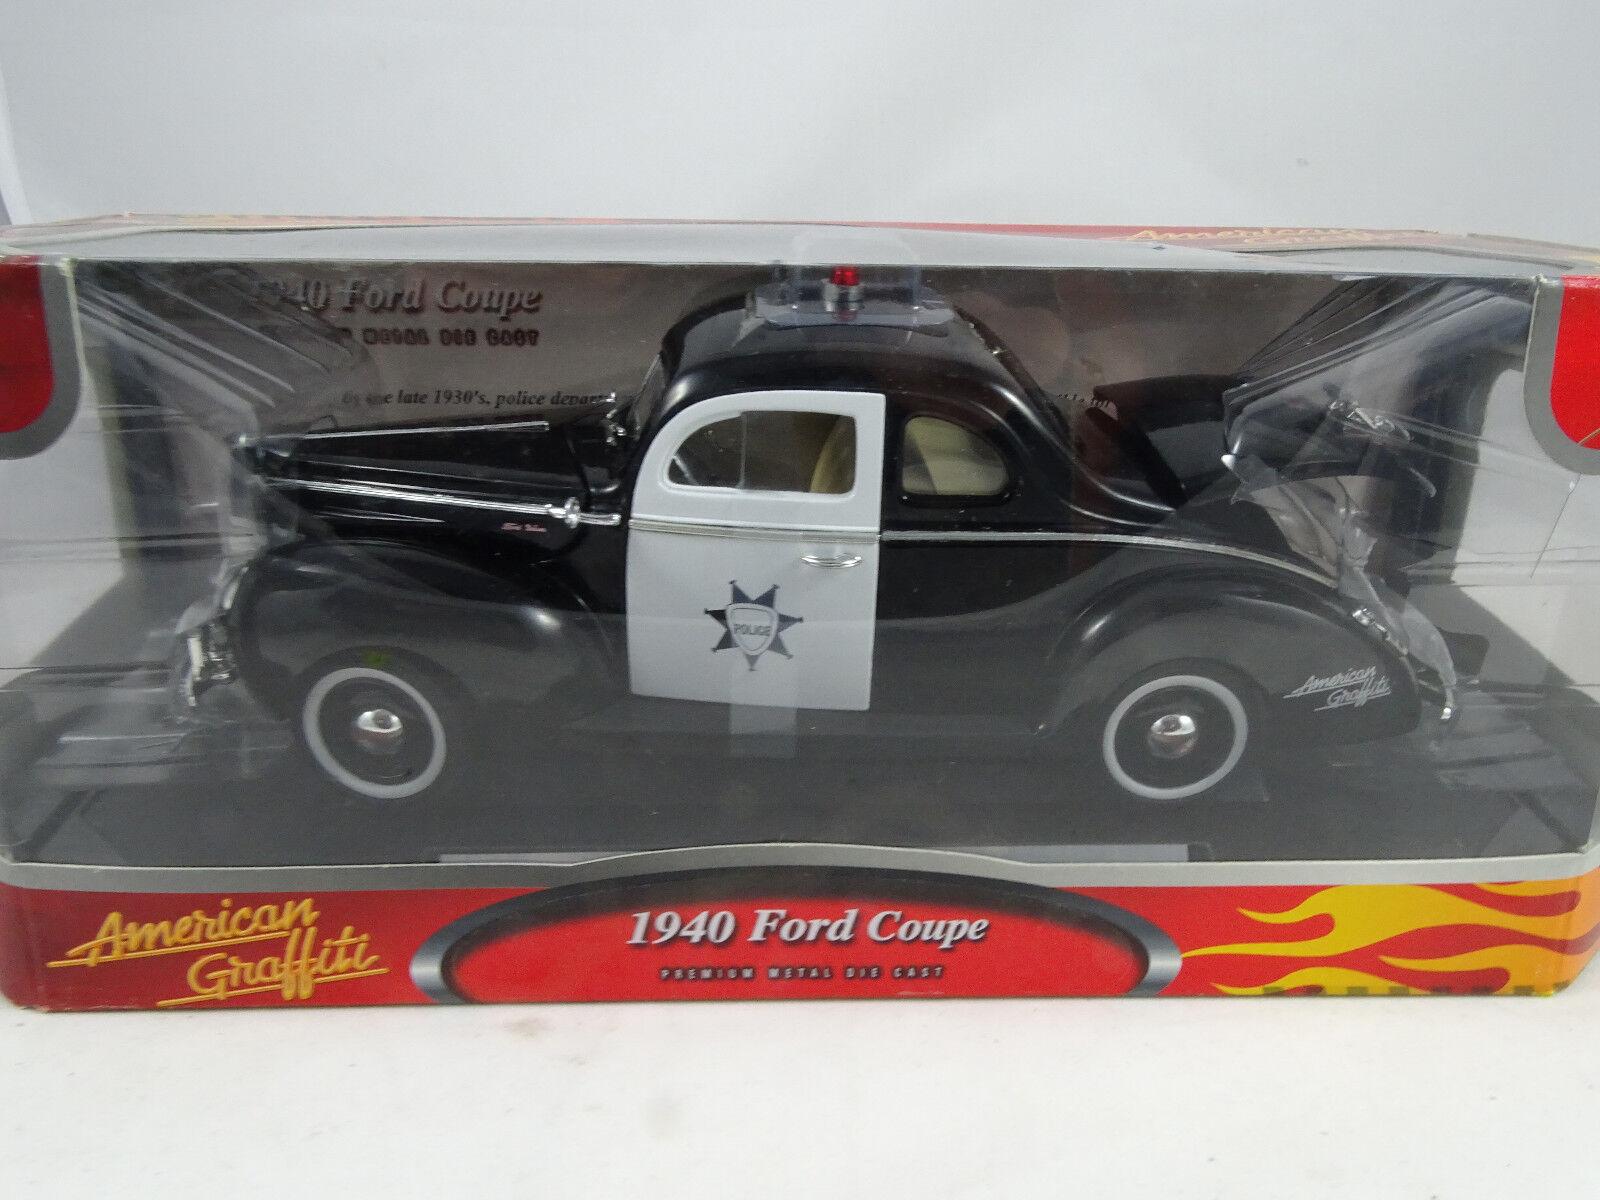 18 von max filmmodell american graffiti 1940 ford coupé polizei - rarit ä t